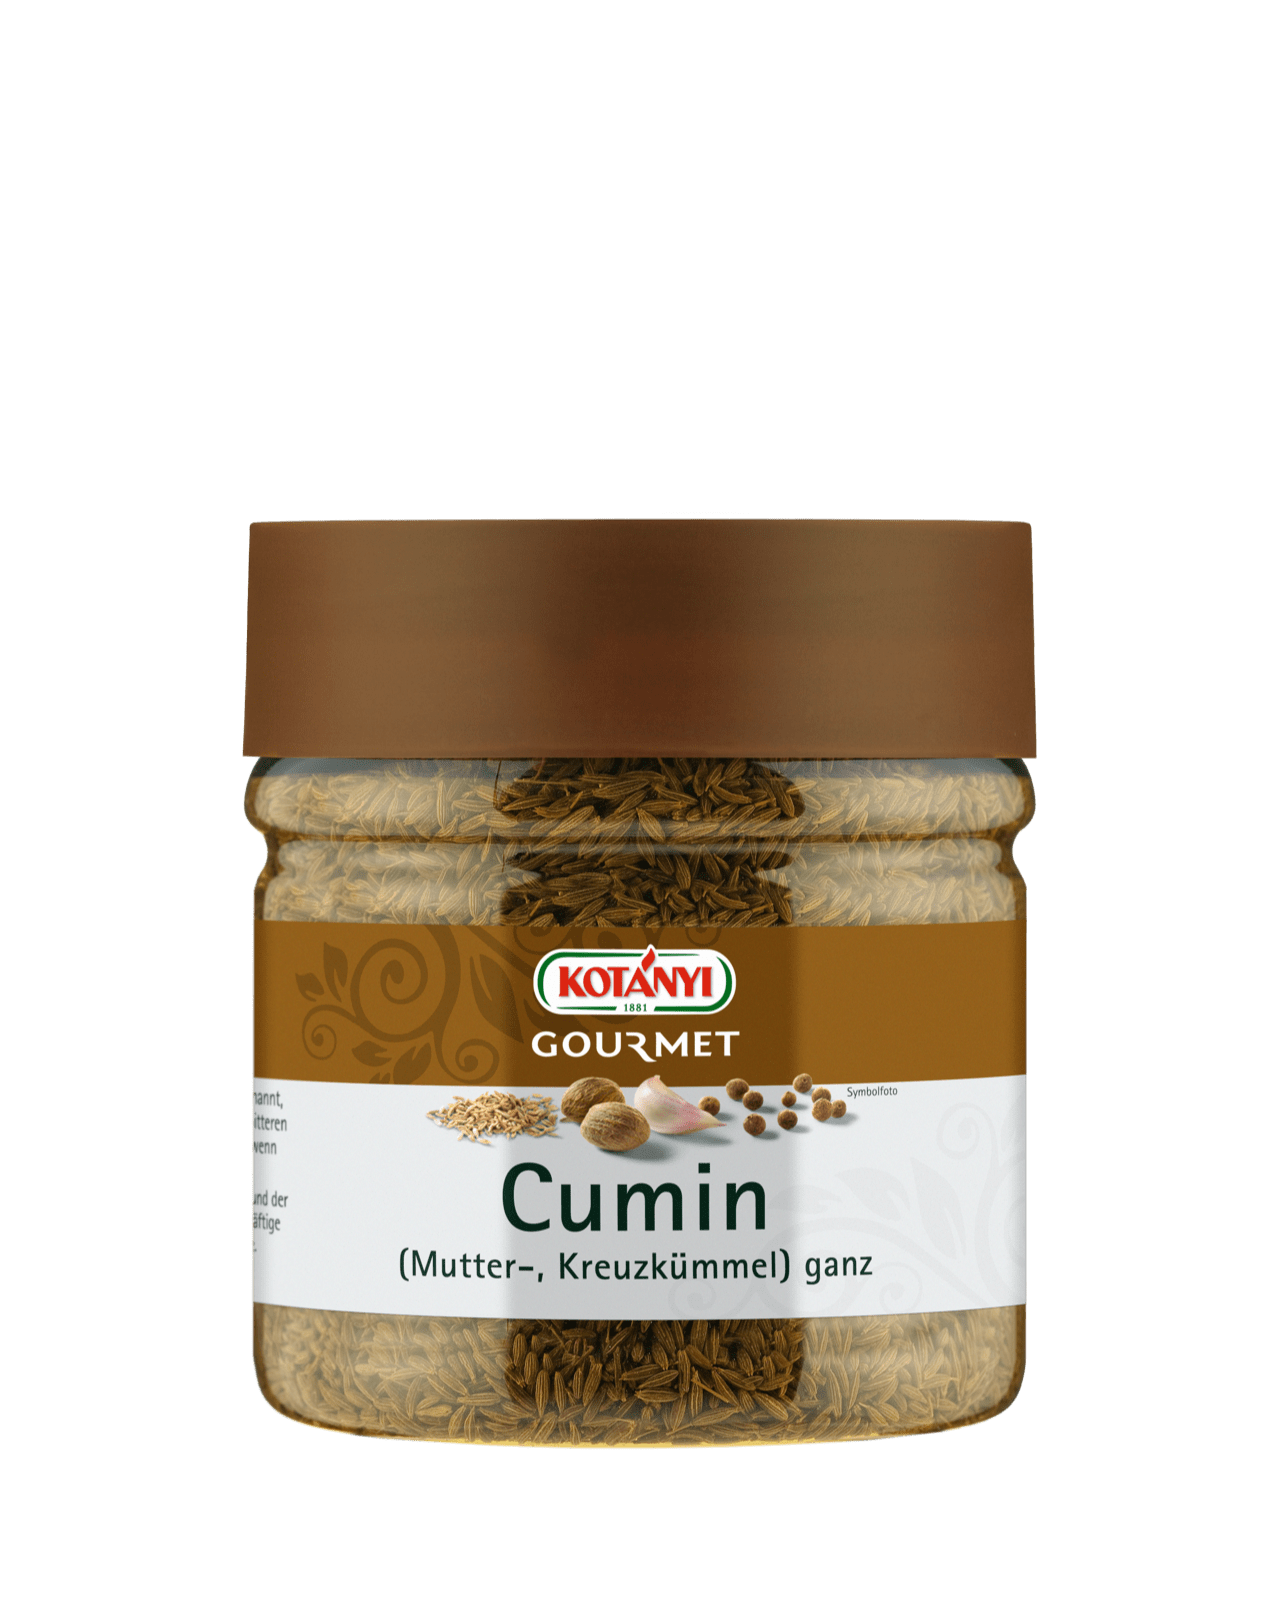 Kotányi Gourmet Cumin Kreuzkümmel ganz in der 400ccm Dose